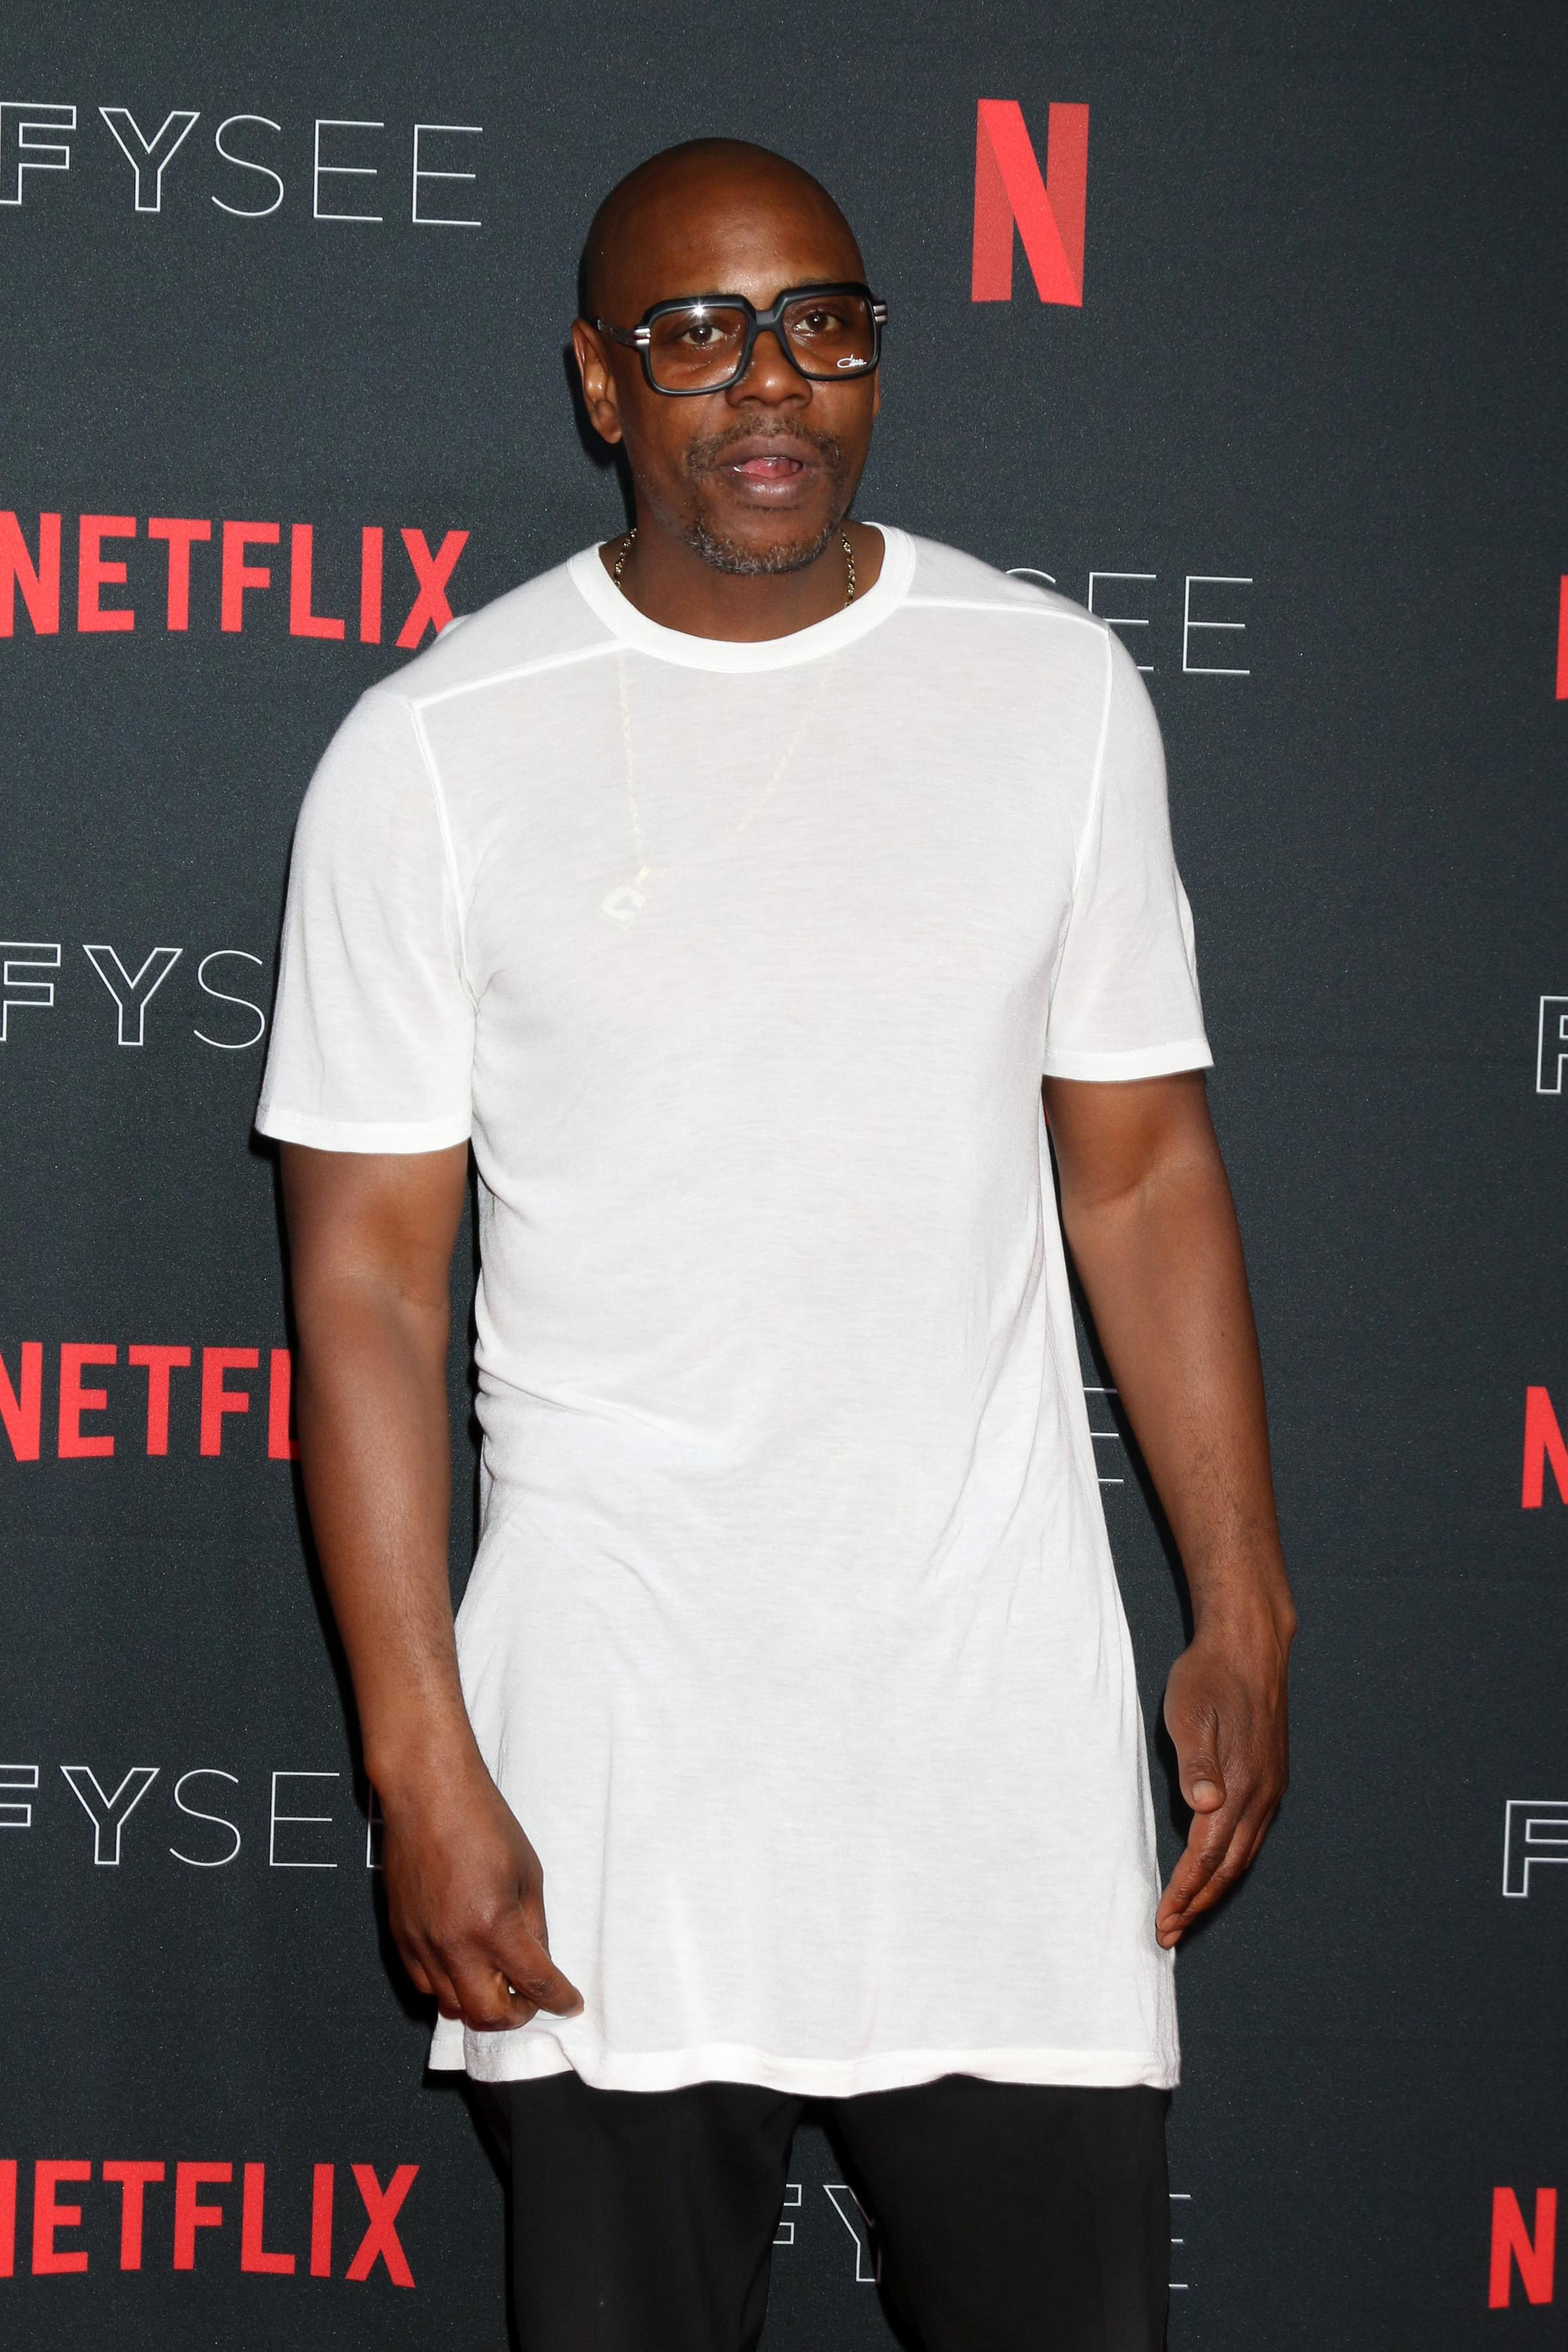 'Chappelle's Show' Returns to Netflix!